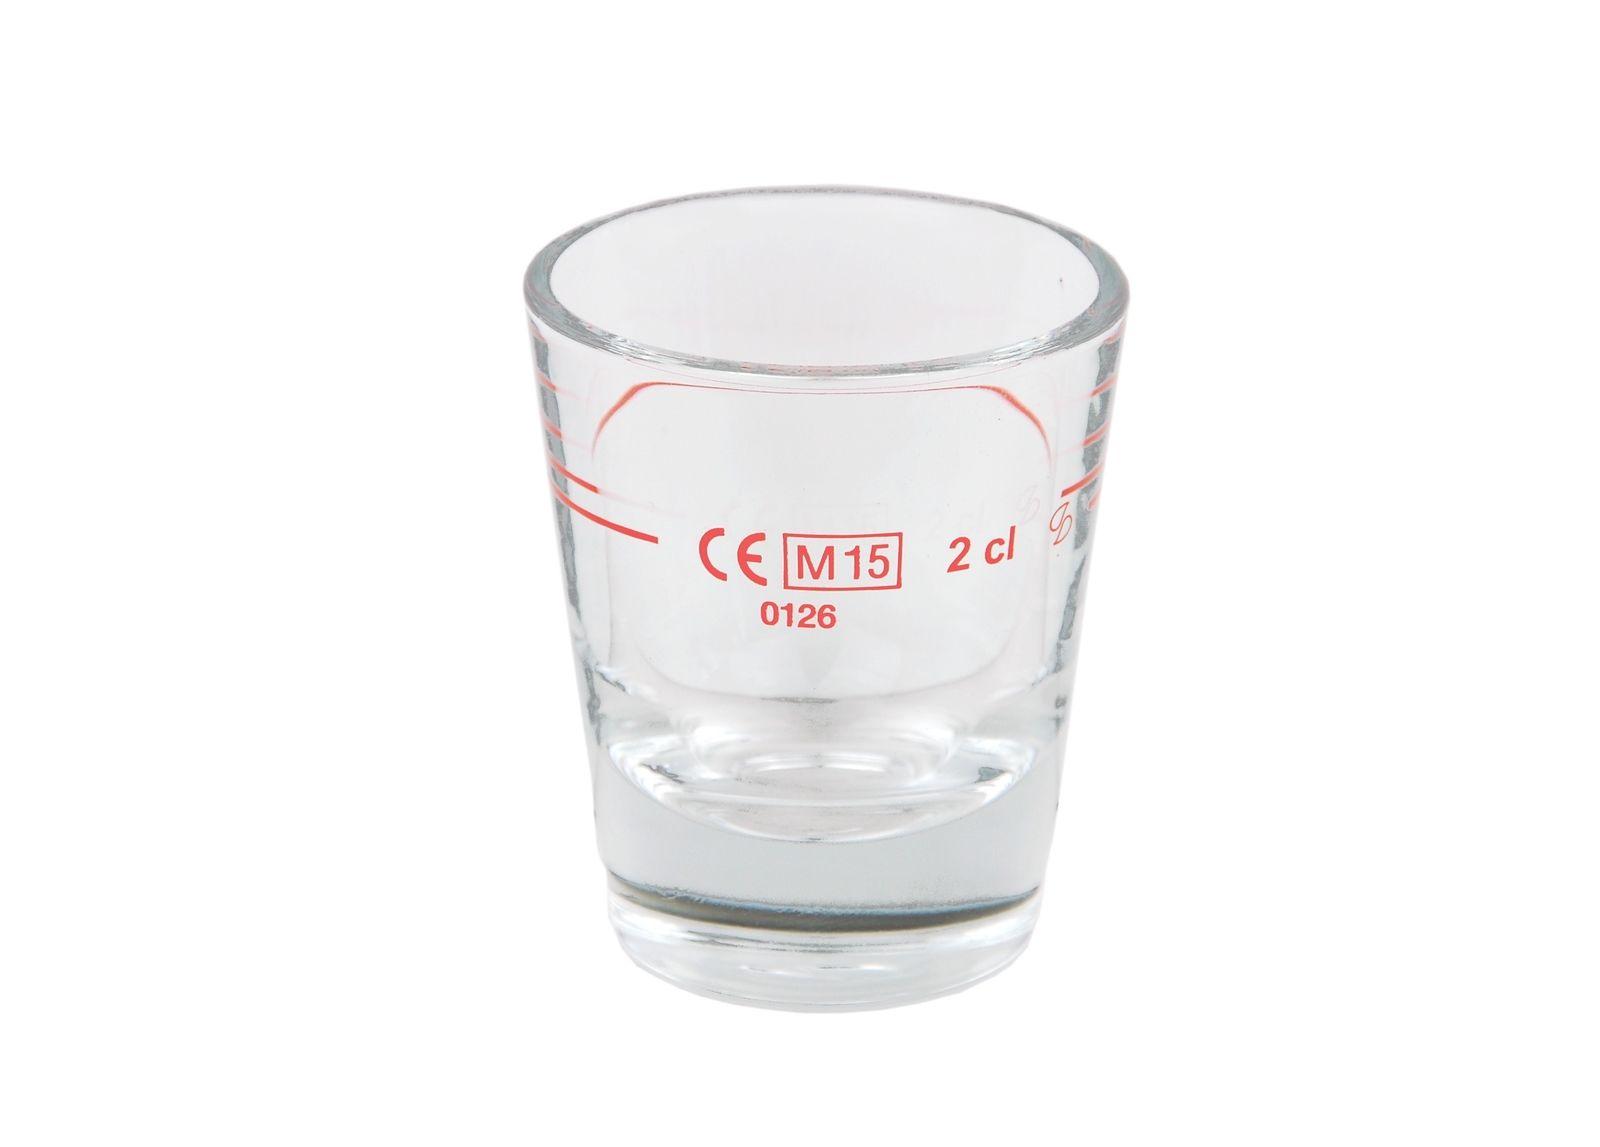 Schnapsglas 2cl